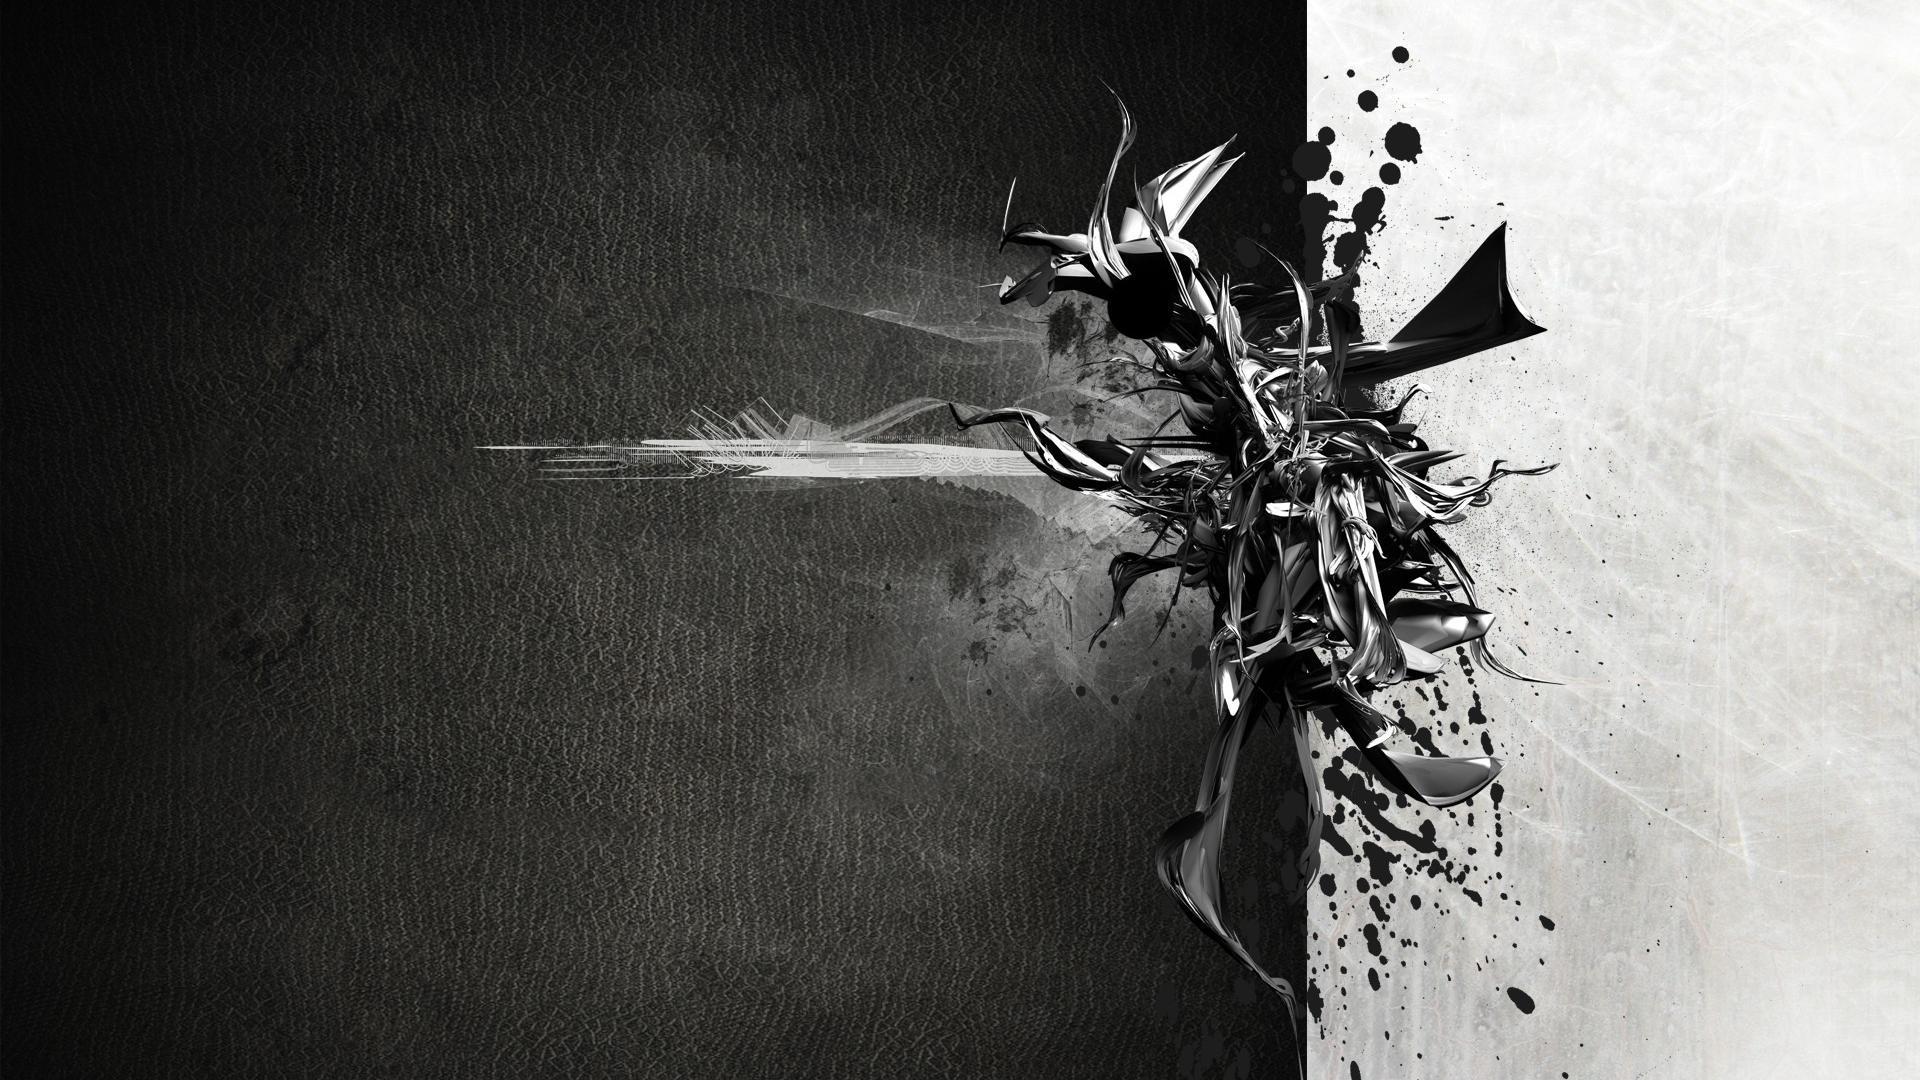 Res: 1920x1080, Black Wallpaper Abstract